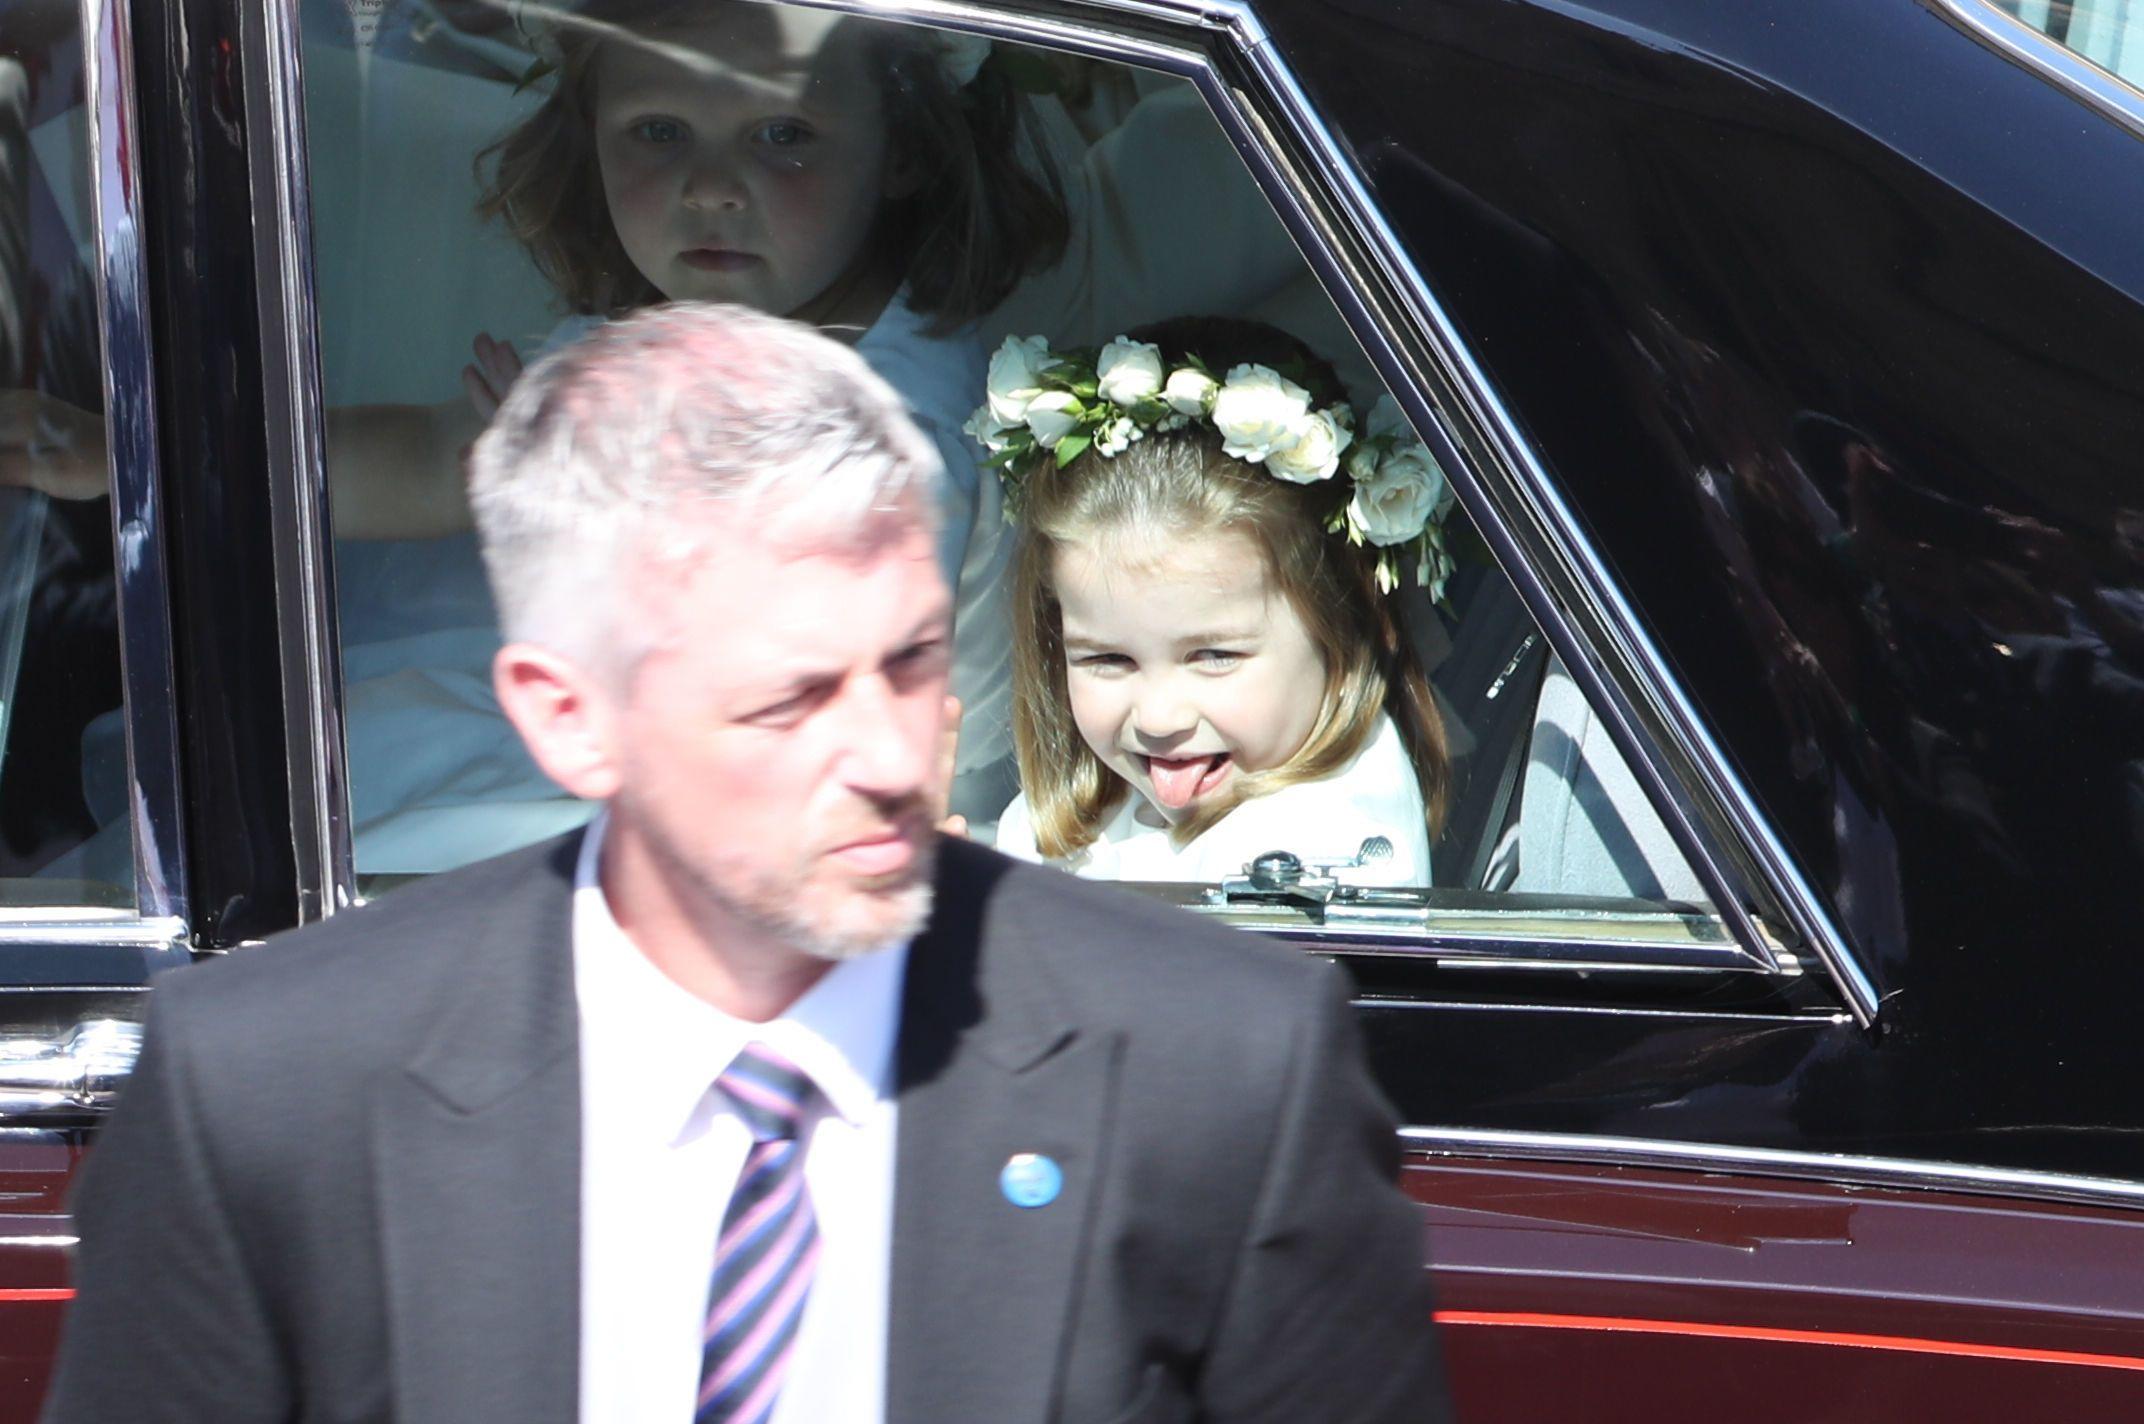 https://hips.hearstapps.com/hmg-prod.s3.amazonaws.com/images/royal-wedding-2018-princess-charlotte-1526744343.jpg